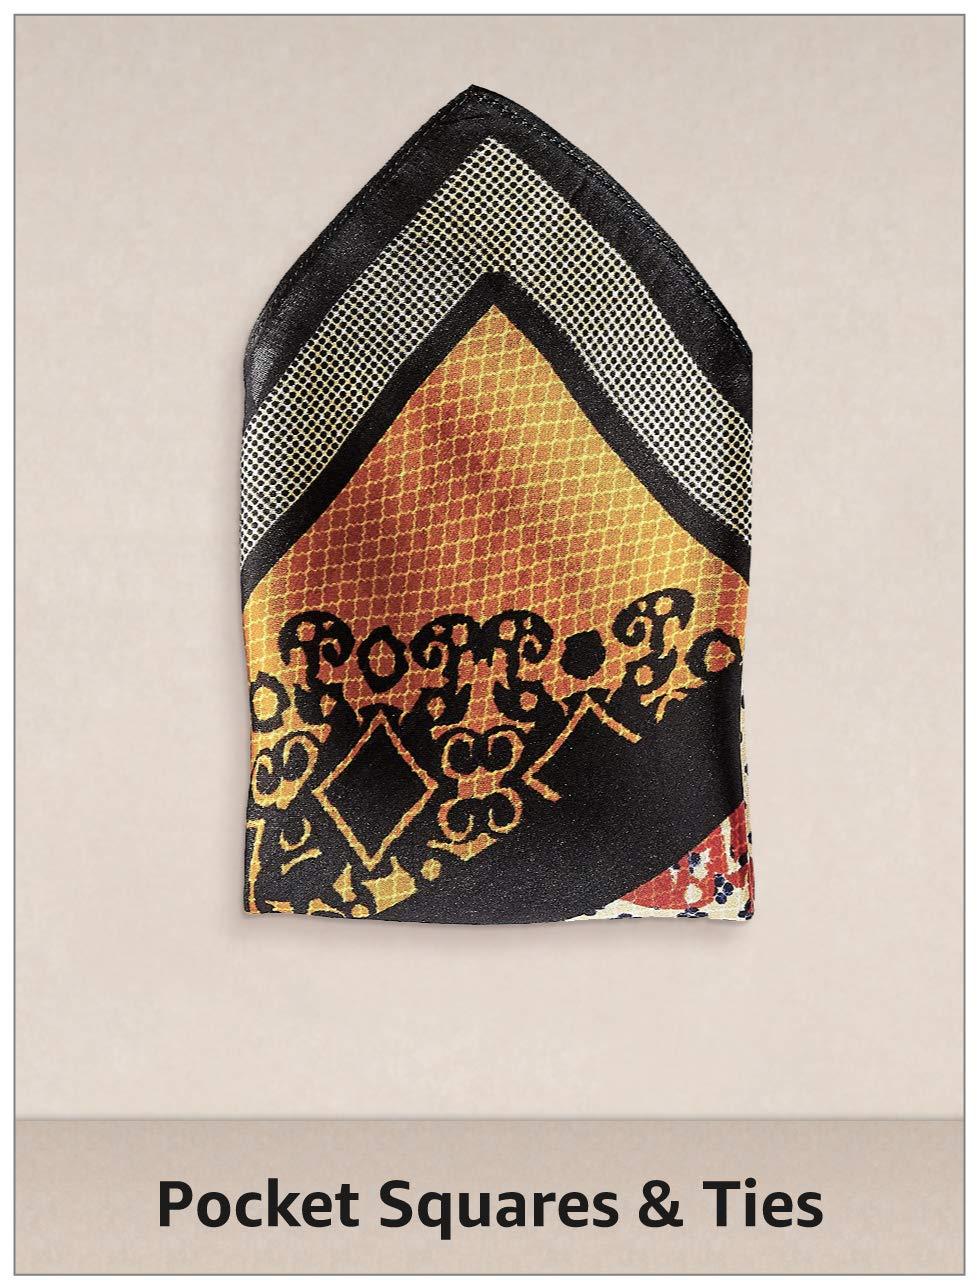 Pocket Squares & Ties